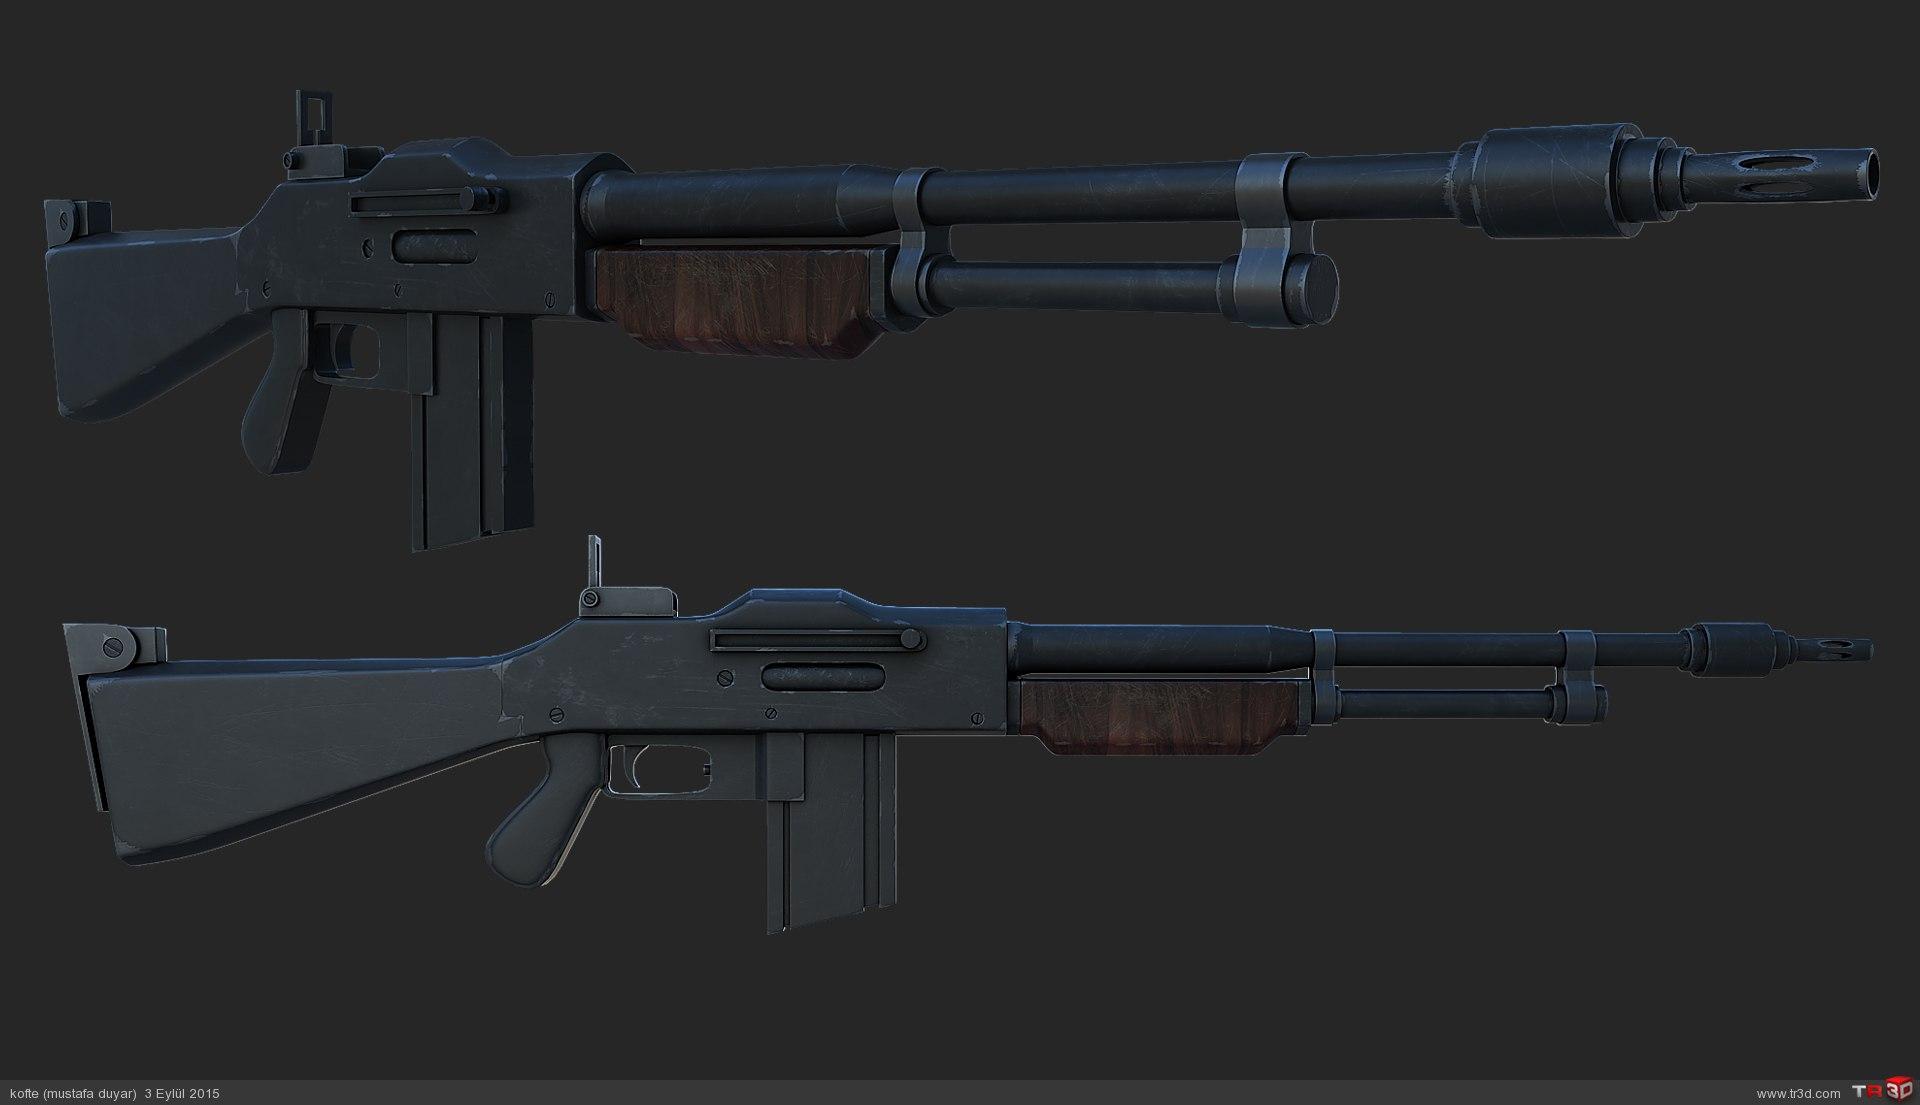 otomatik tüfek / rifle